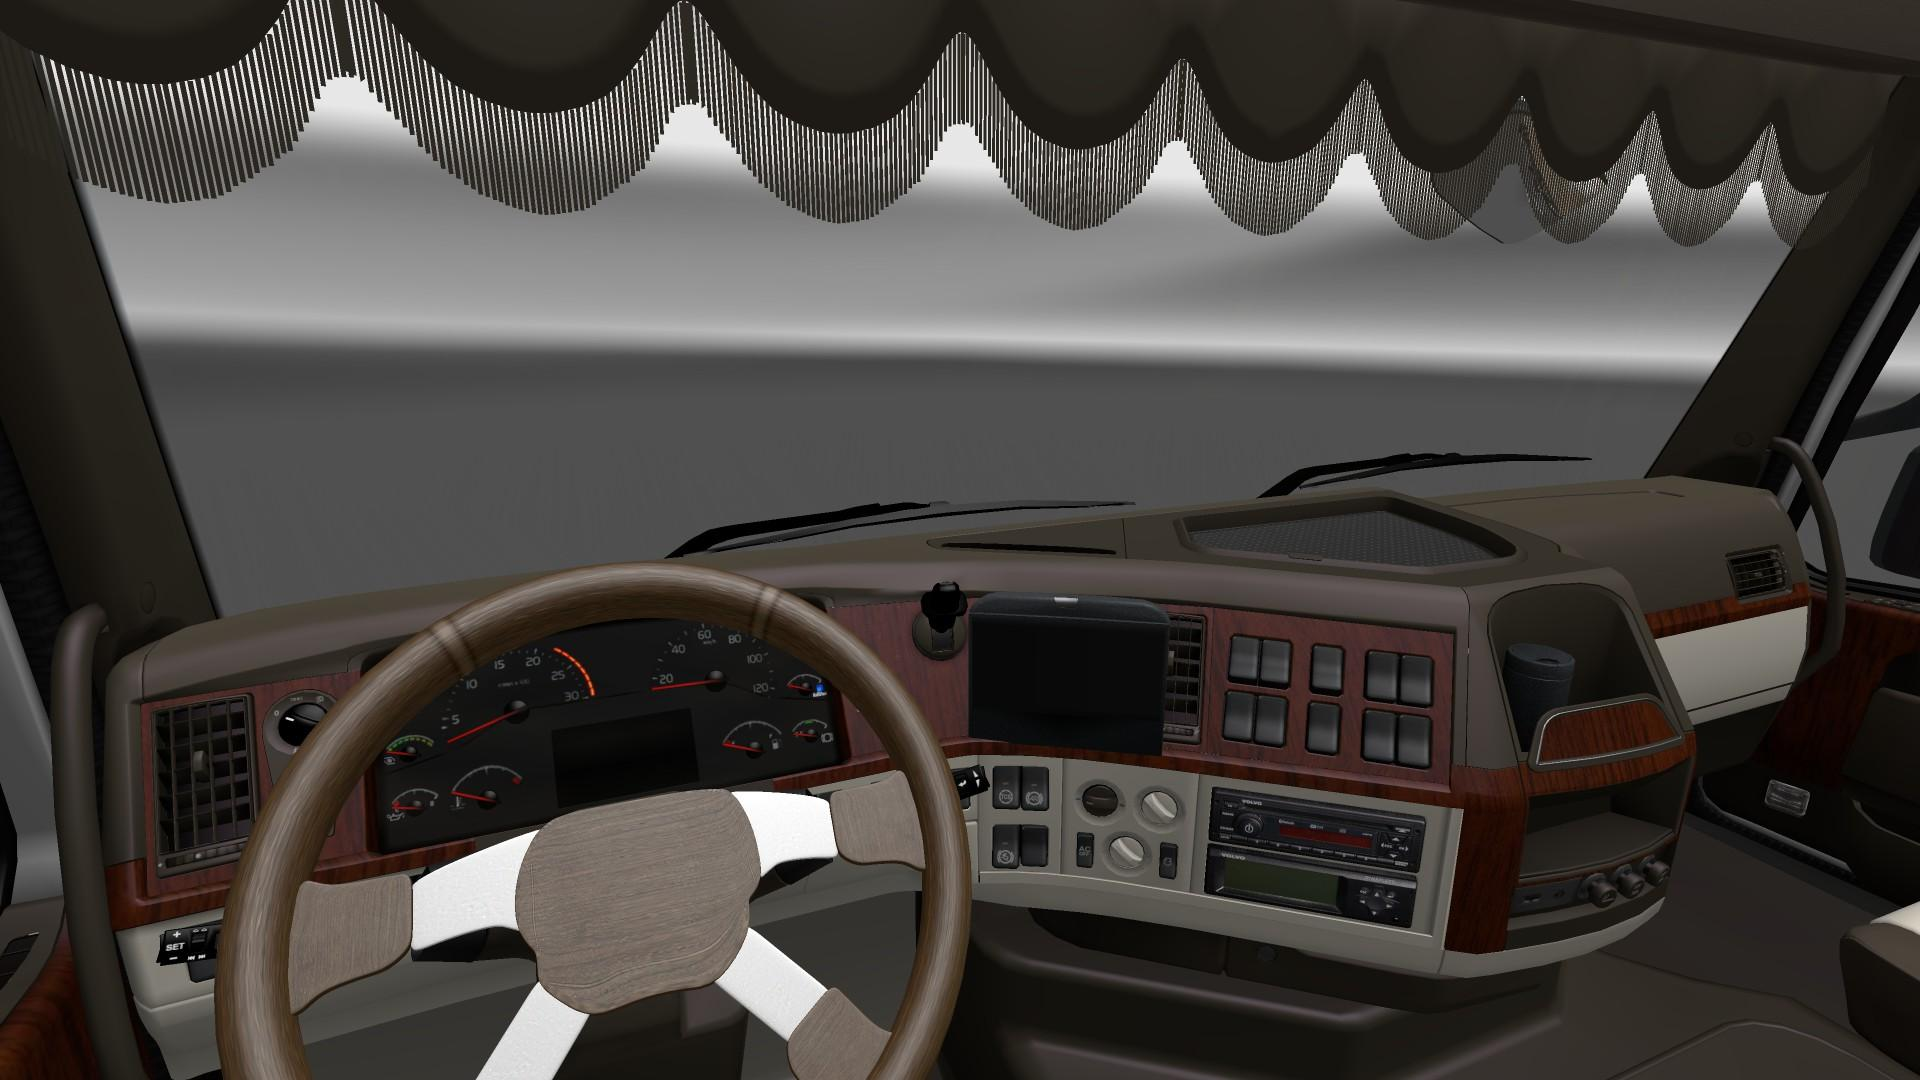 VOLVO FH16 GREEK 1.22 Truck -Euro Truck Simulator 2 Mods